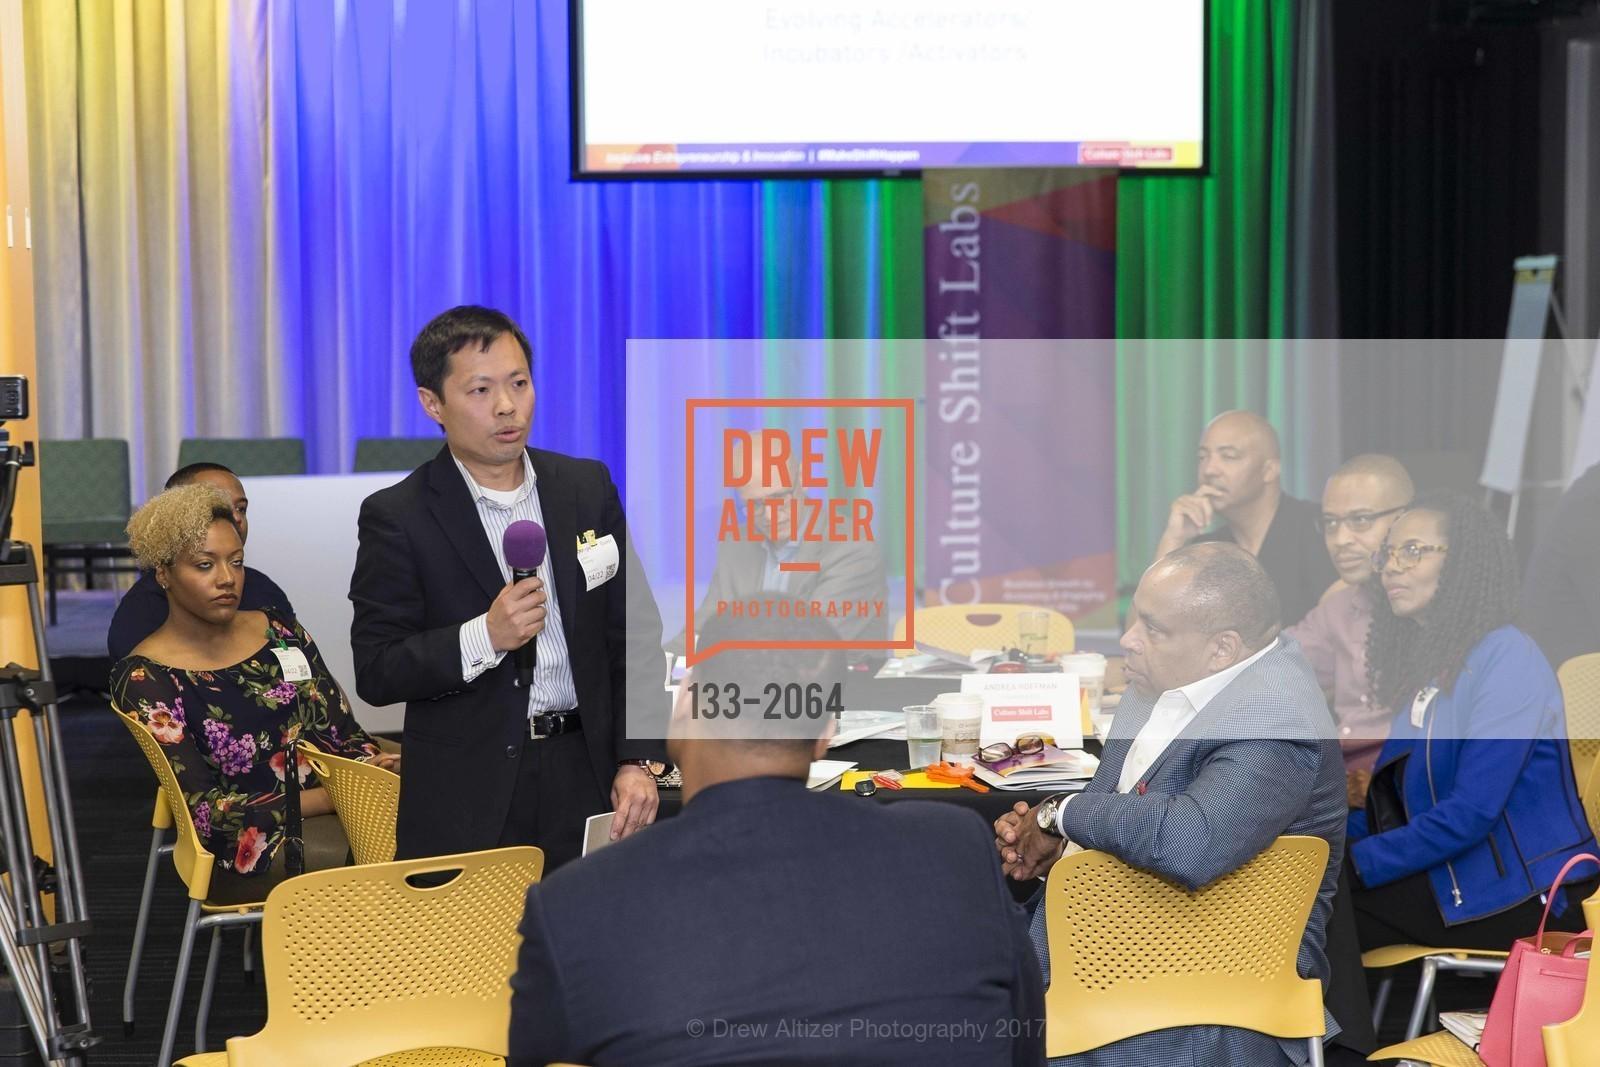 John Duong, 3rd Annual Culture Shifting Weekend-Olympic Tech Talk, Mountain View, April 22nd, 2017